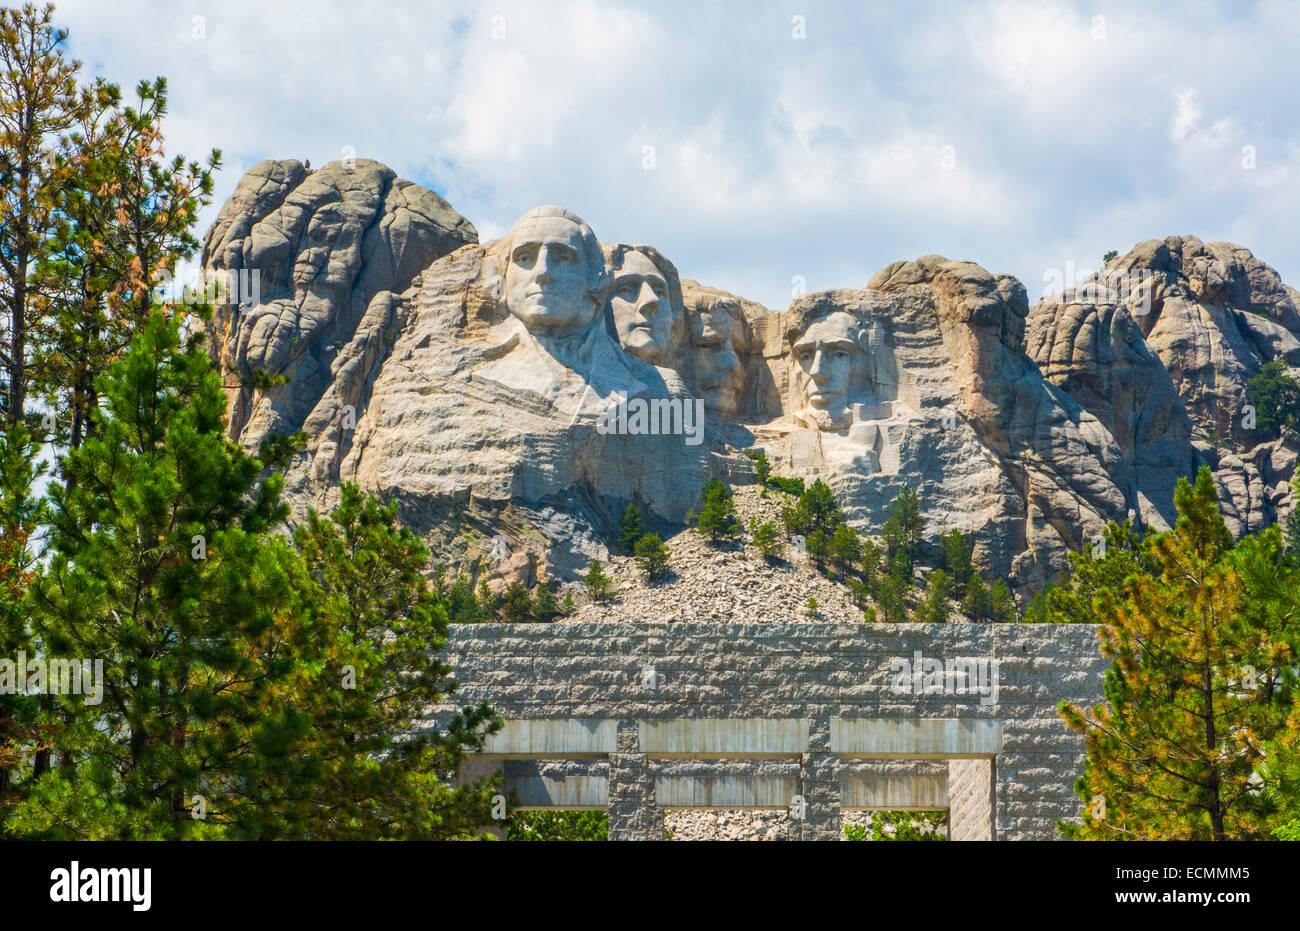 Mount Rushmore South Dakota Keystone  National Memorial of  Presidents in stone on mountain landmark attraction - Stock Image